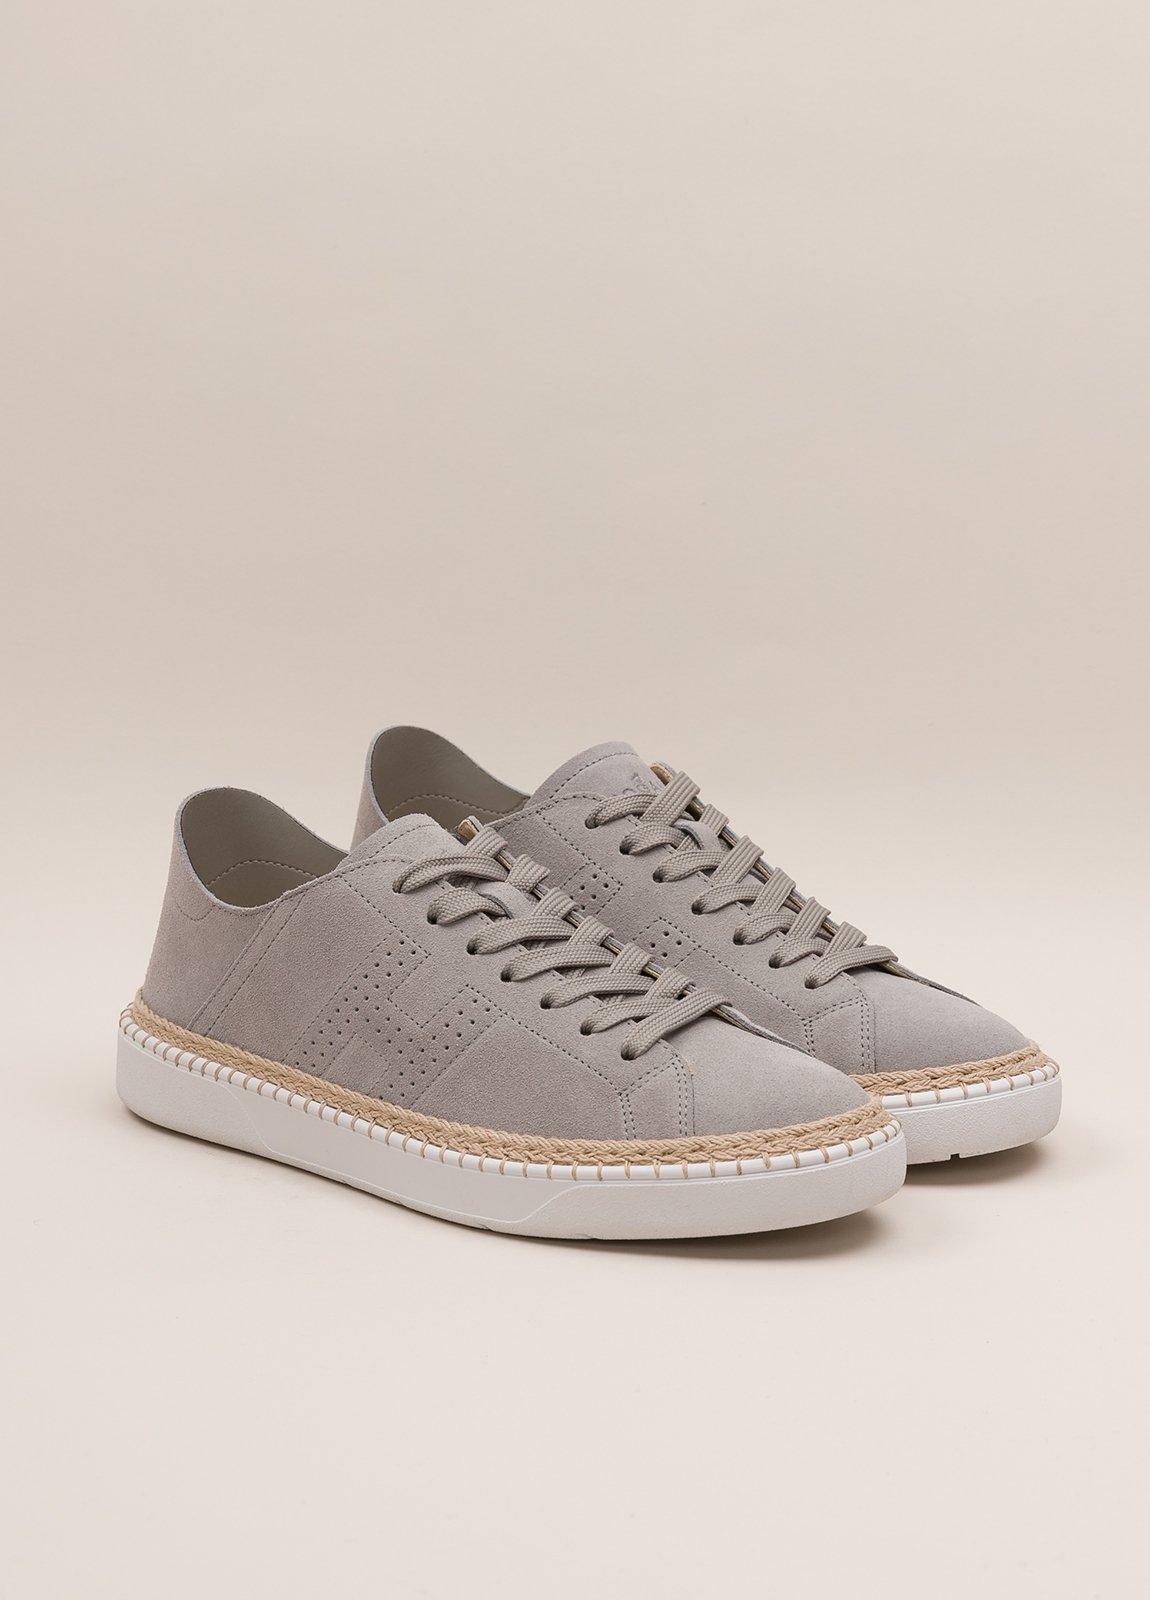 Calzado sport HOGAN gris - Ítem3